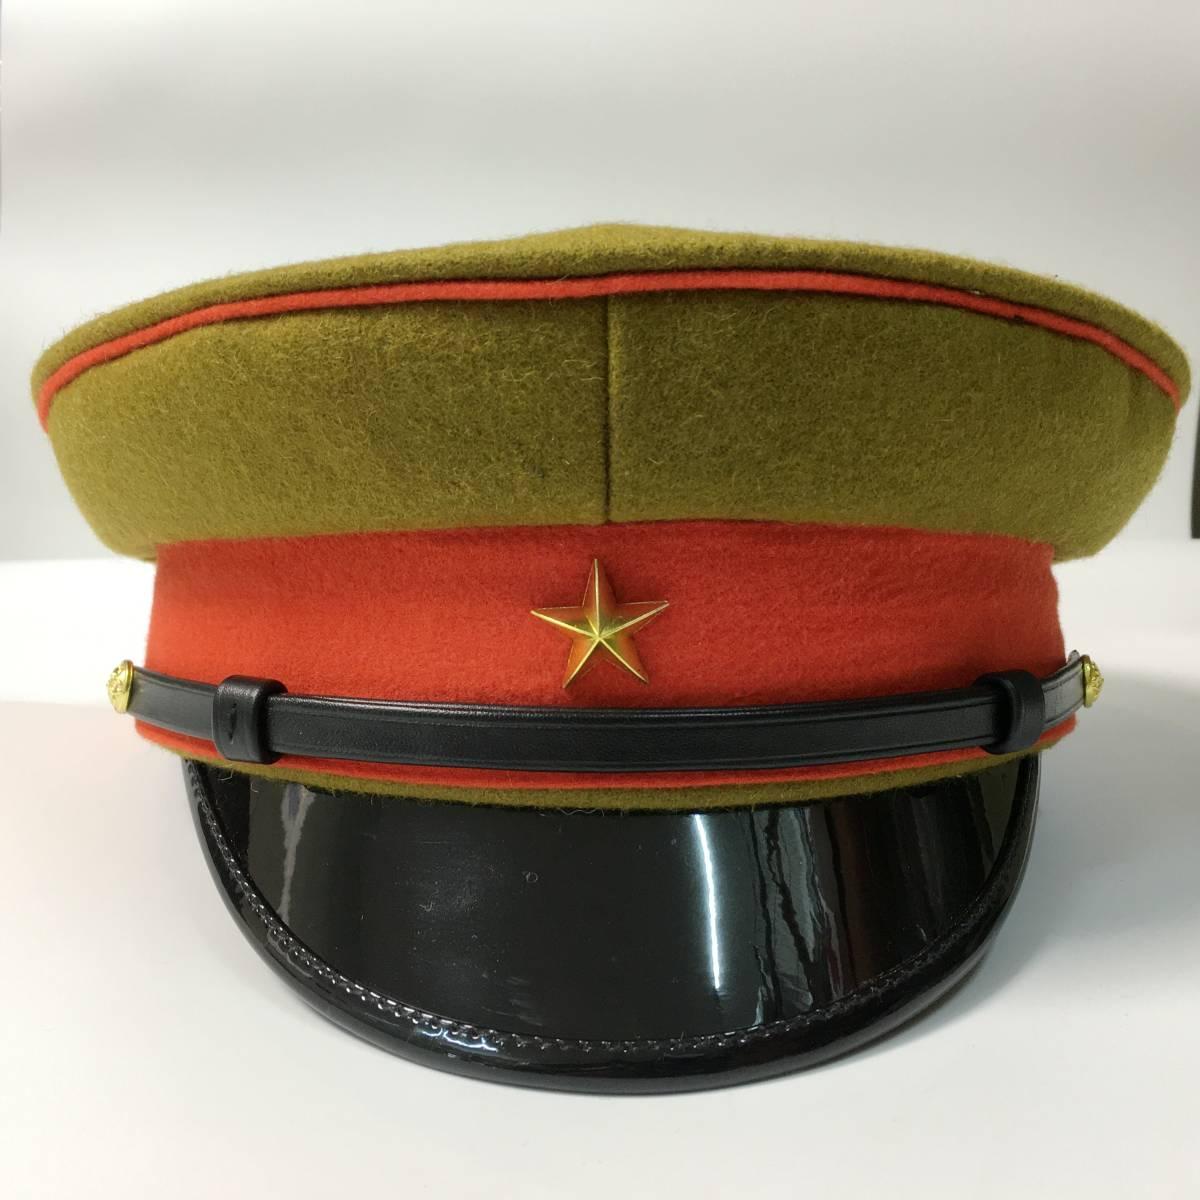 旧日本軍 陸軍将校用制帽 四五式軍帽 ウール製 57cm、58cm、59cm、60cm、61cm レプリカ_画像1